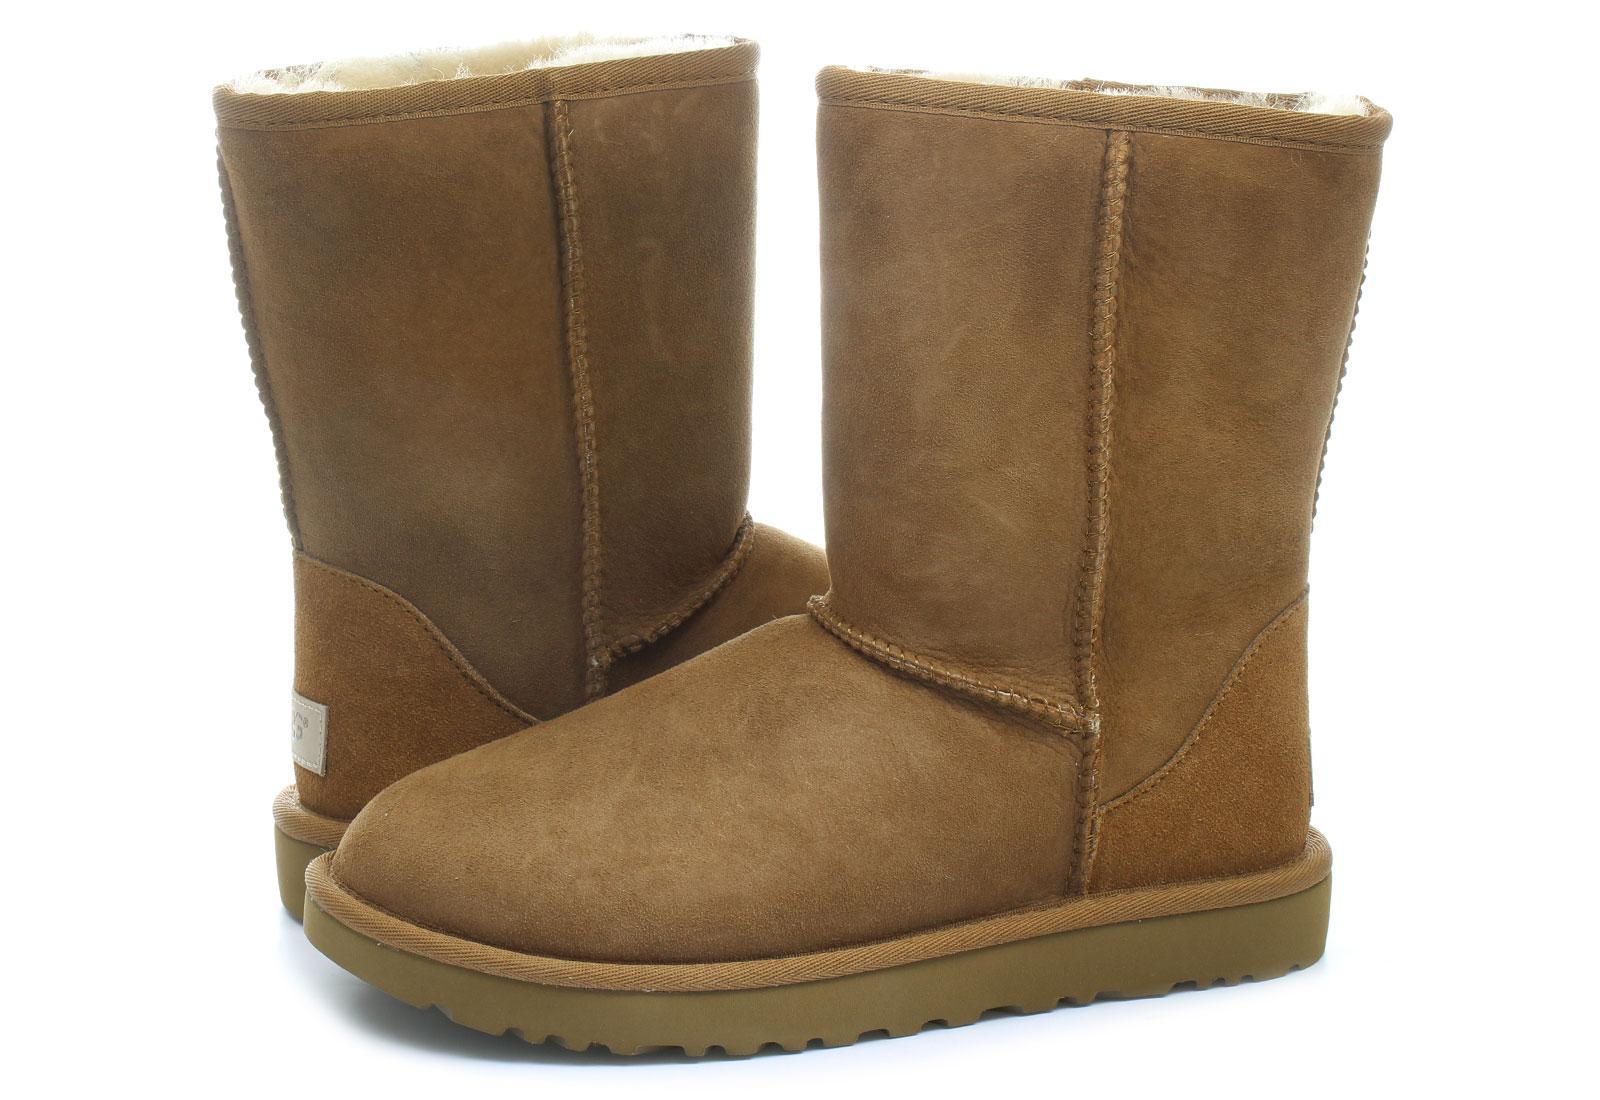 Ugg Csizma - Classic Short Ii - 1016223-CHE - Office Shoes Magyarország 6551904d77